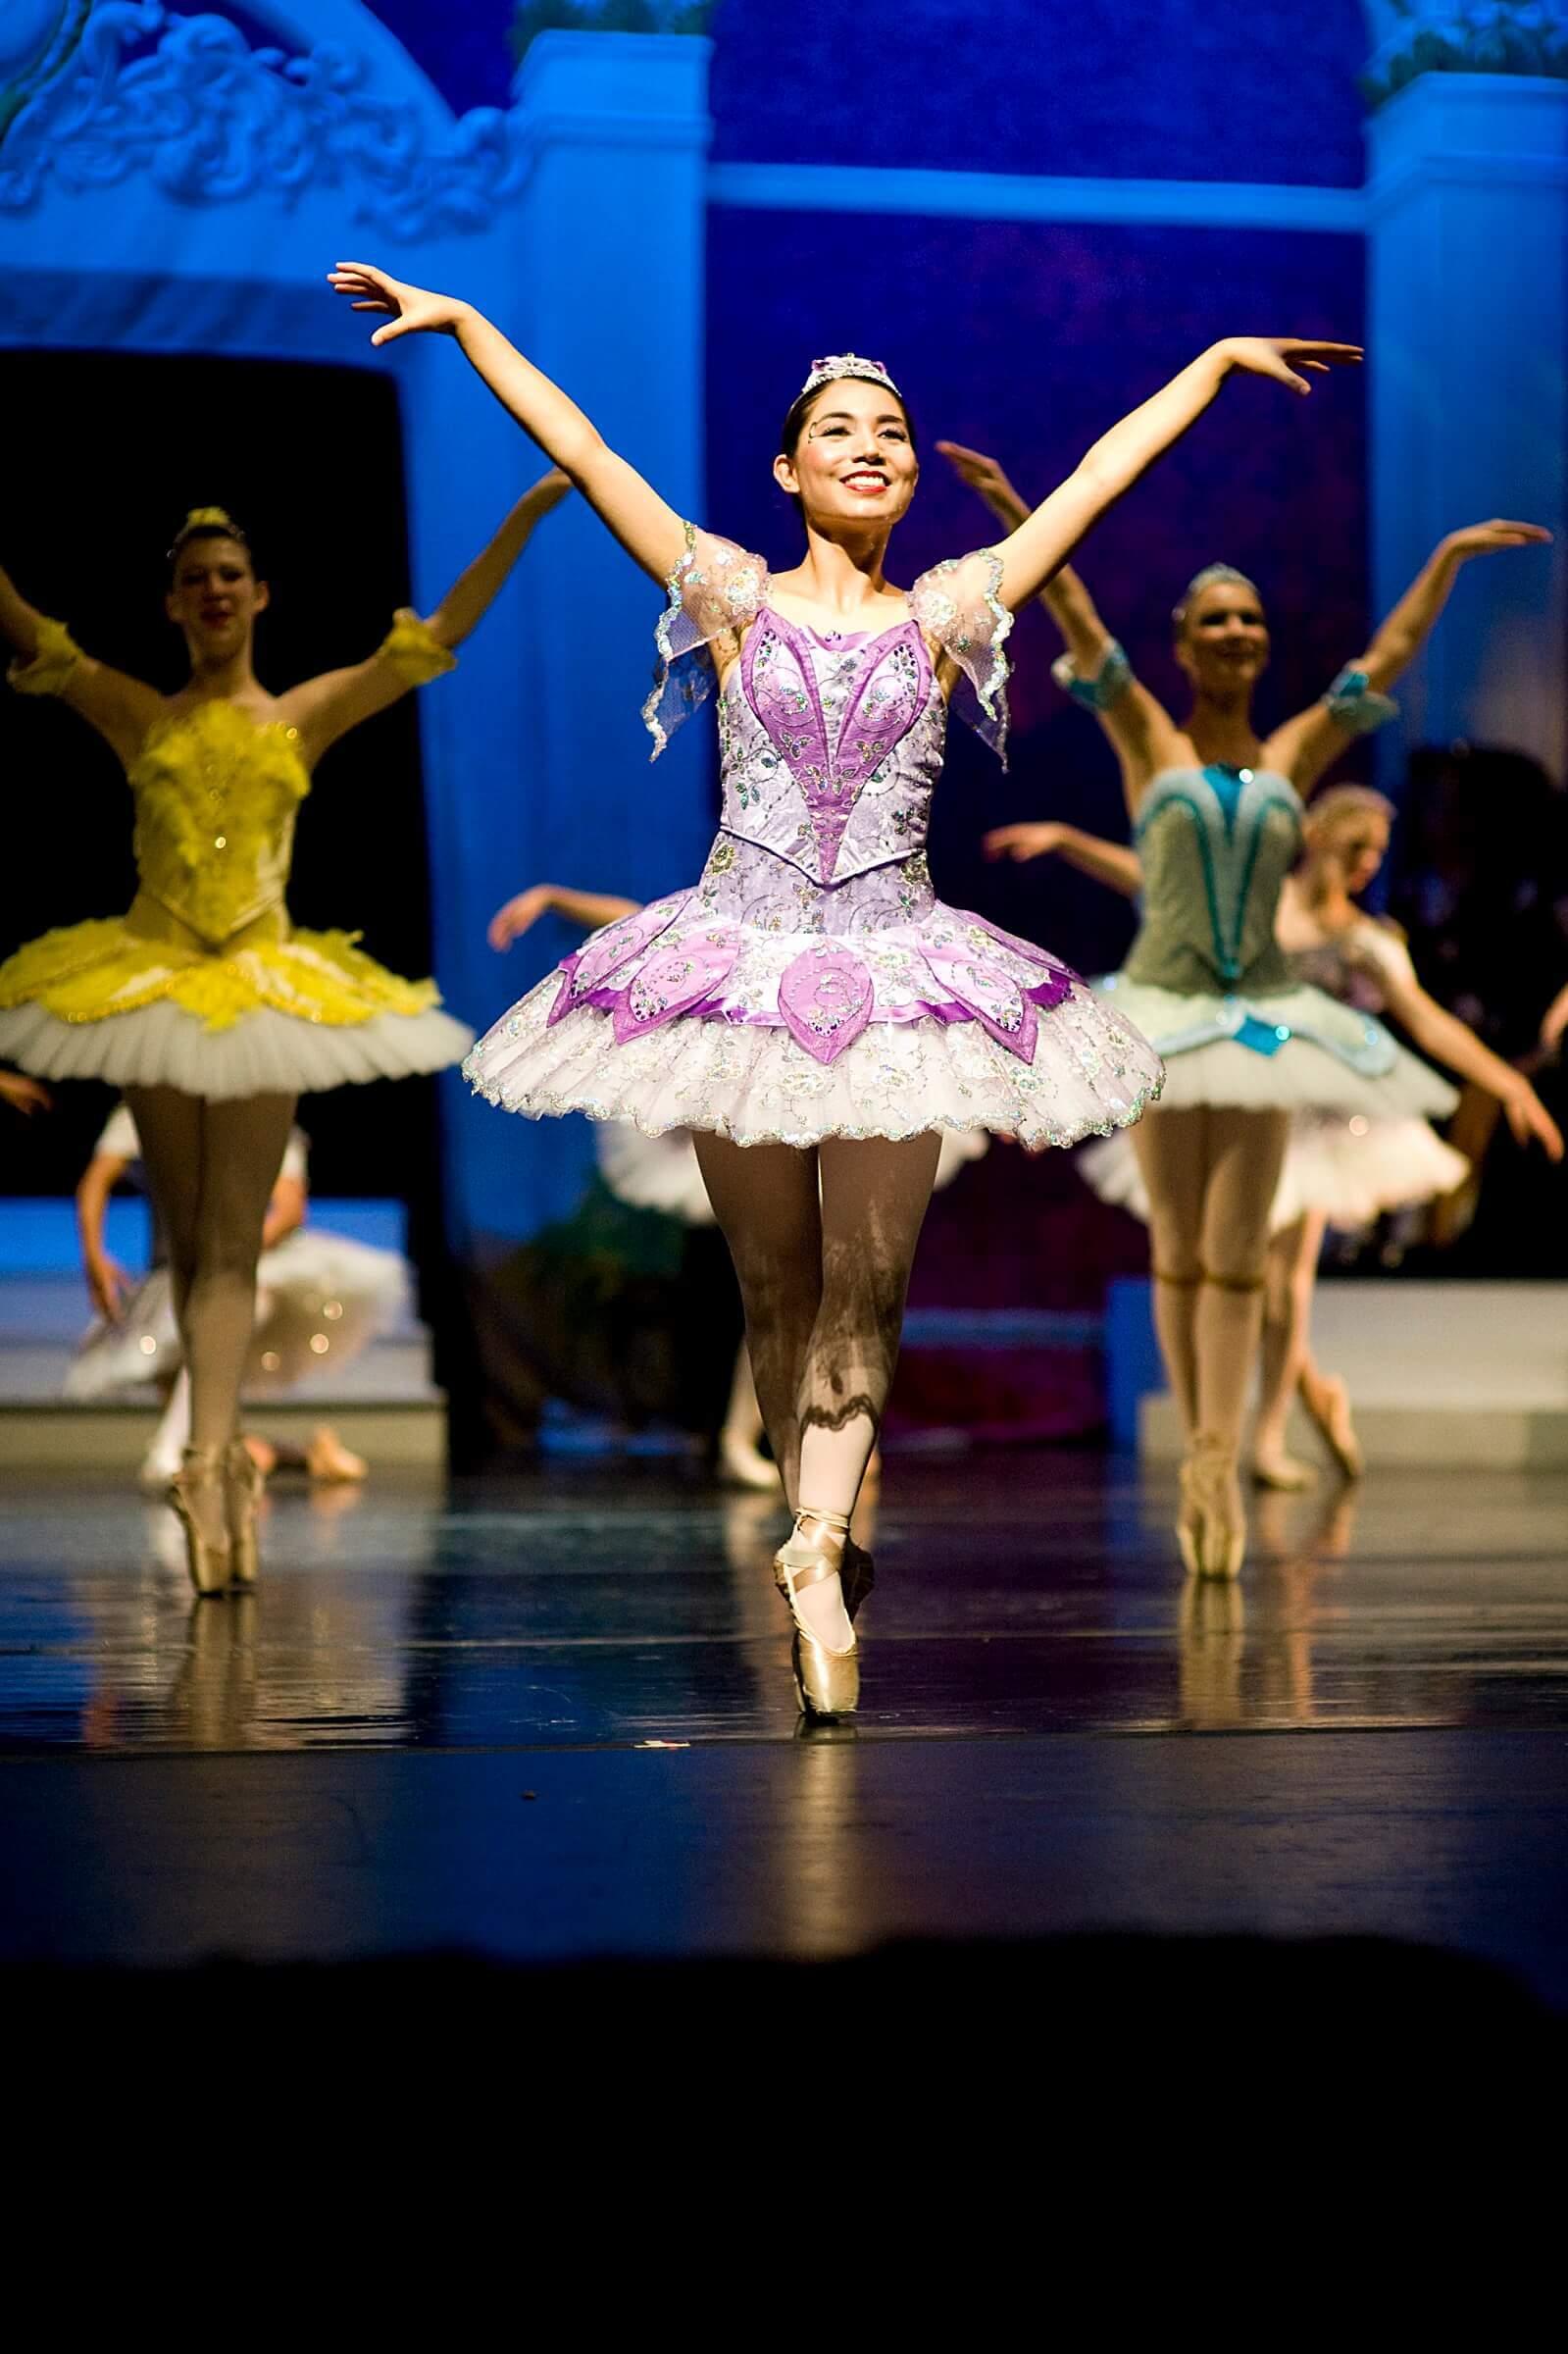 Sleeping Beauty Ballet - Lilac Fairy